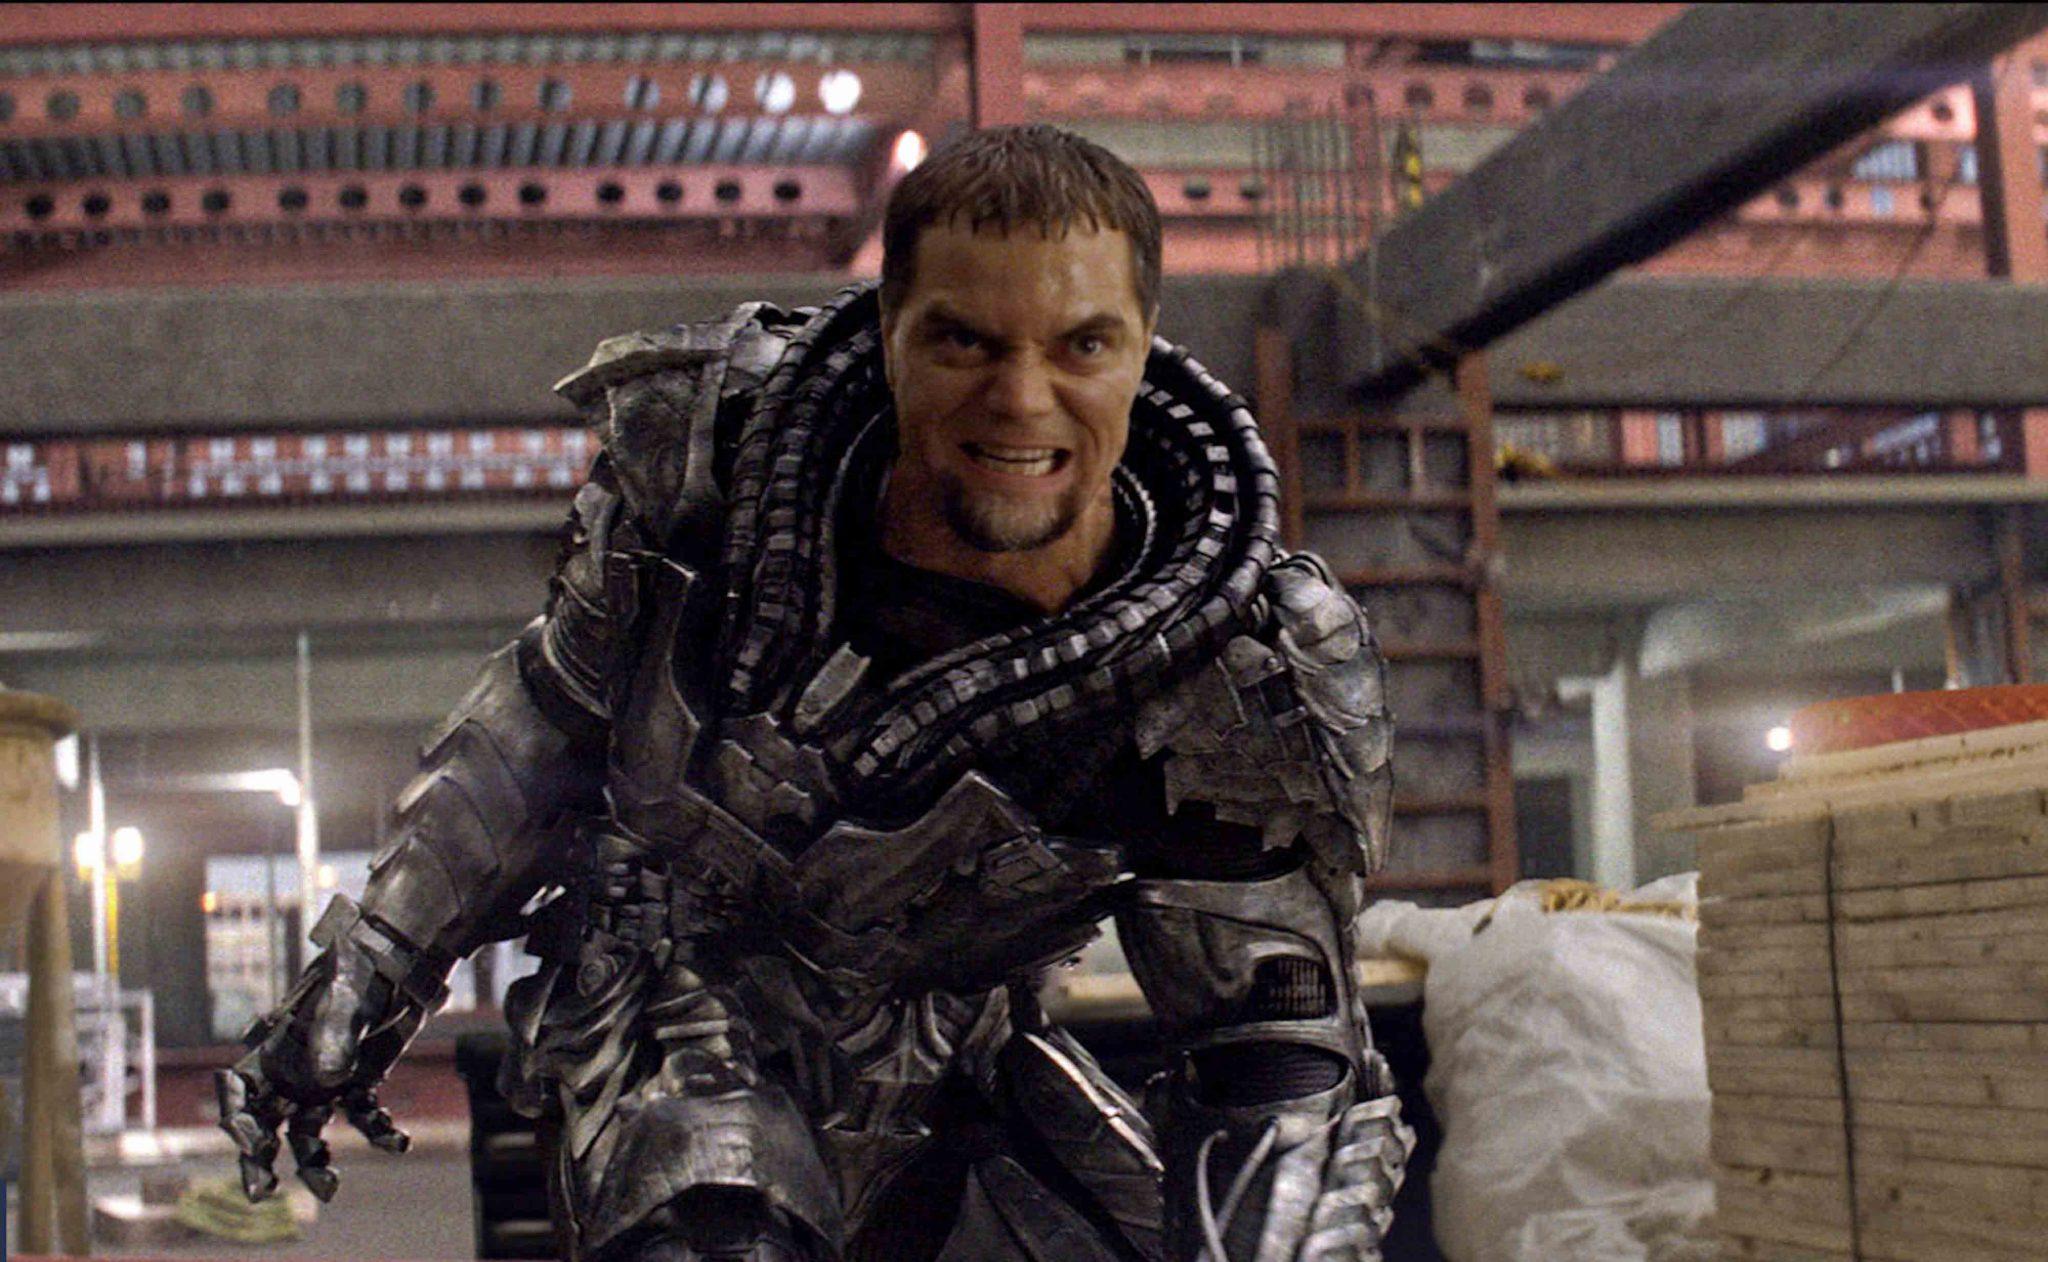 Michael Shannon on Zod's Batman v Superman role